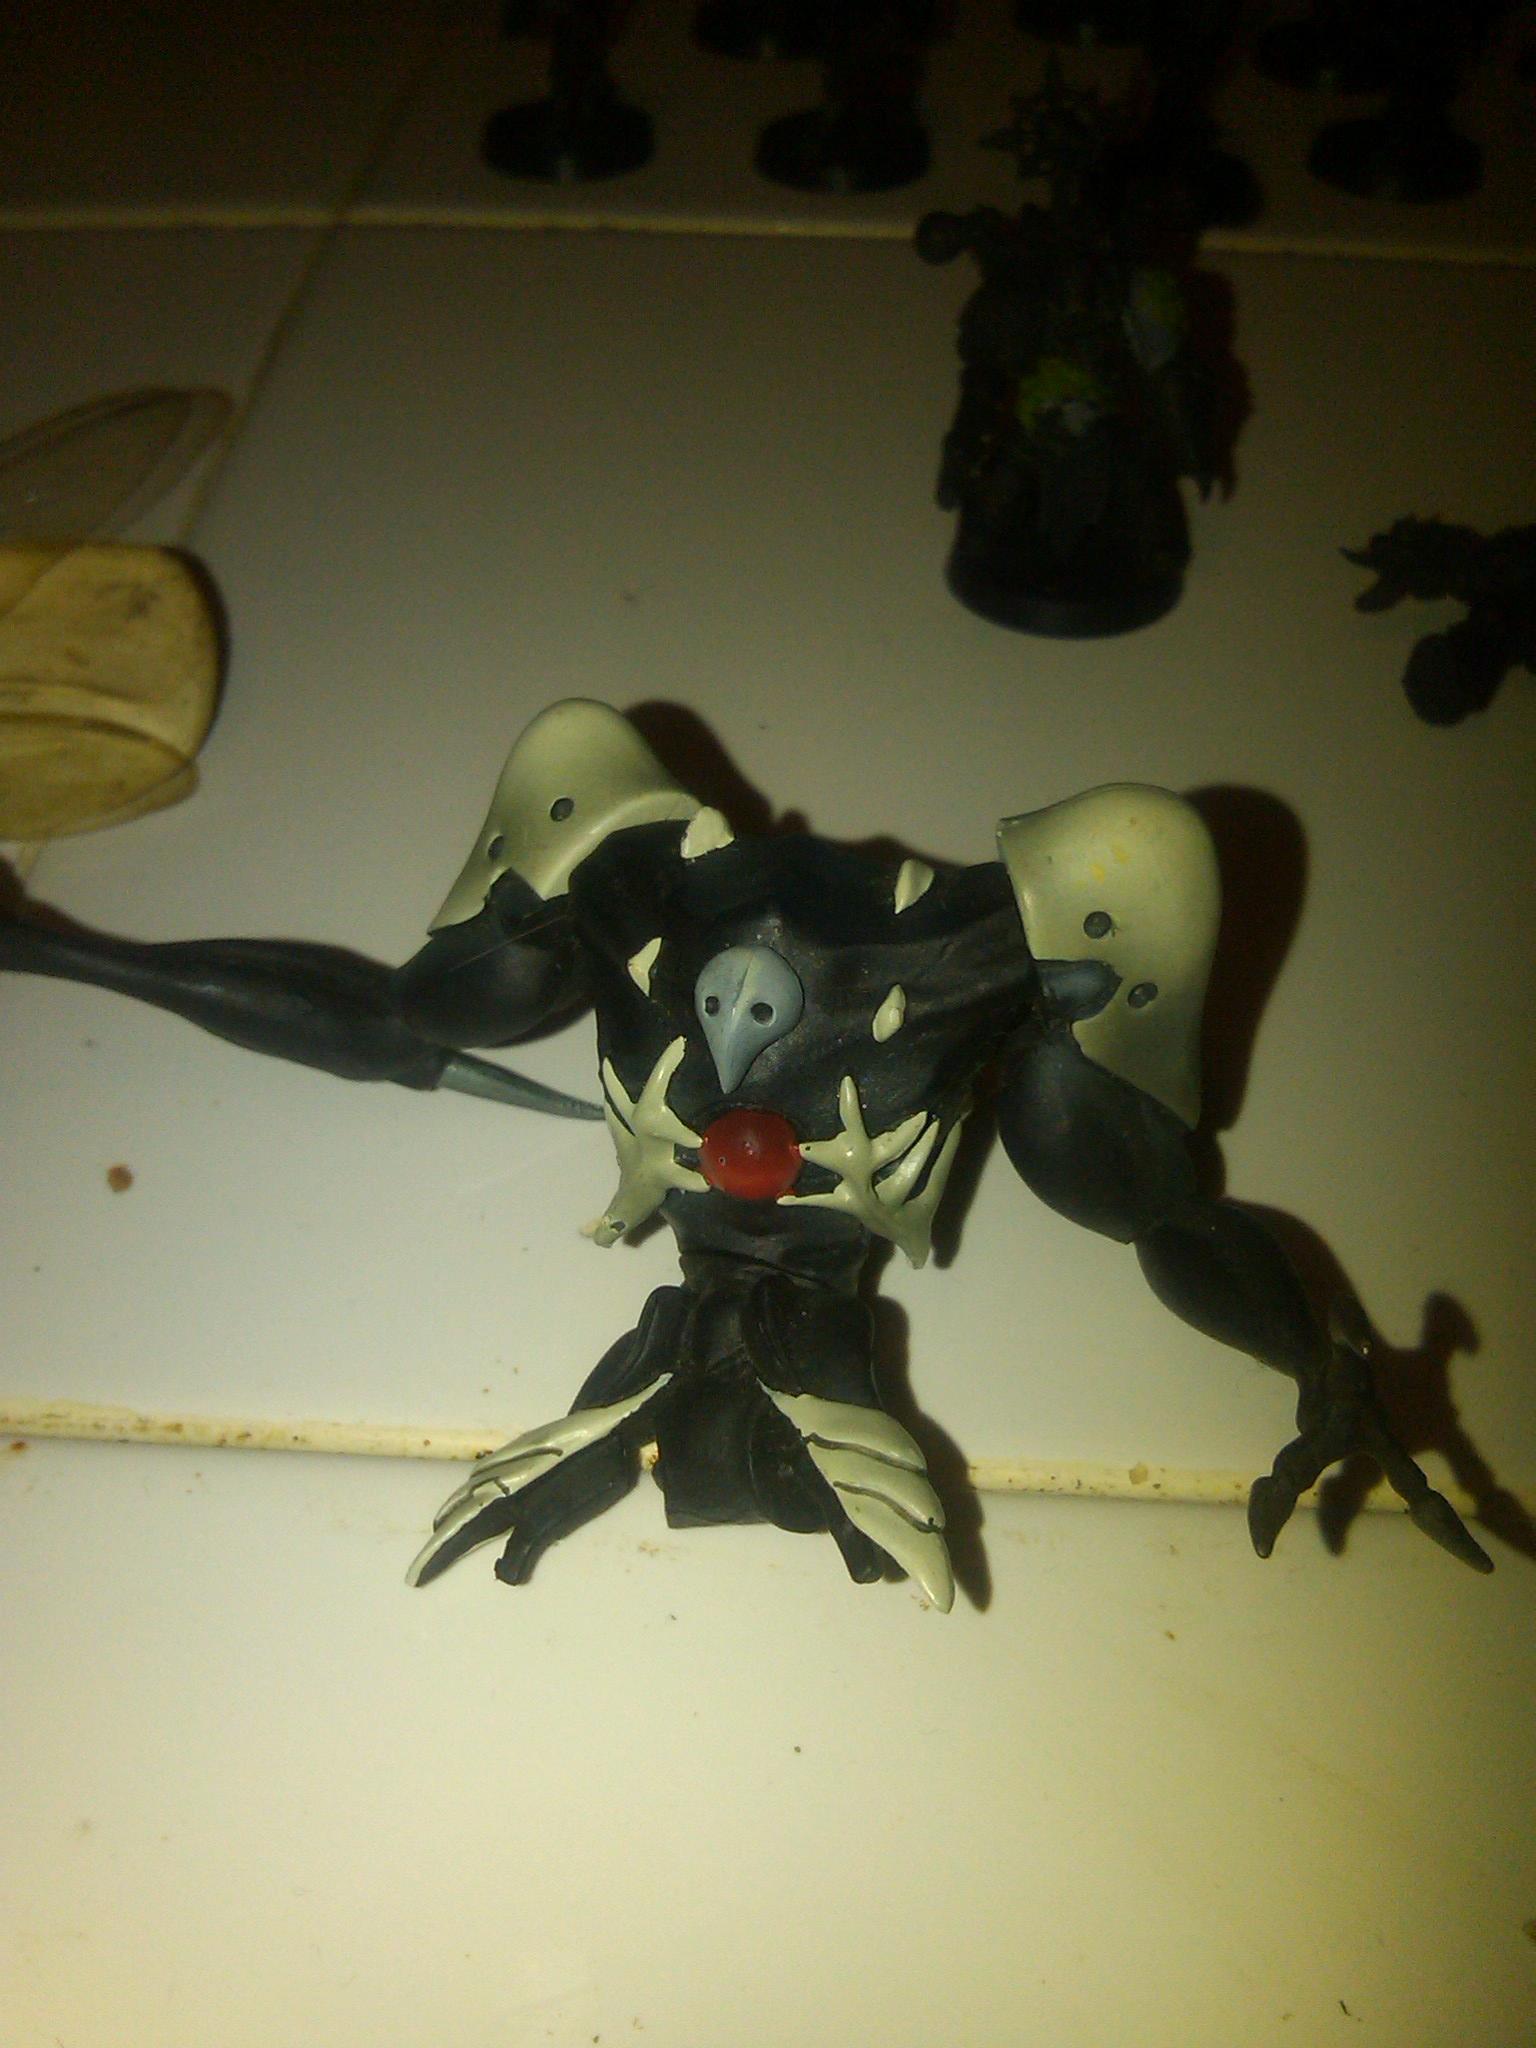 Torso of Karkous, Sachiel, 1st Angel of the EVA series